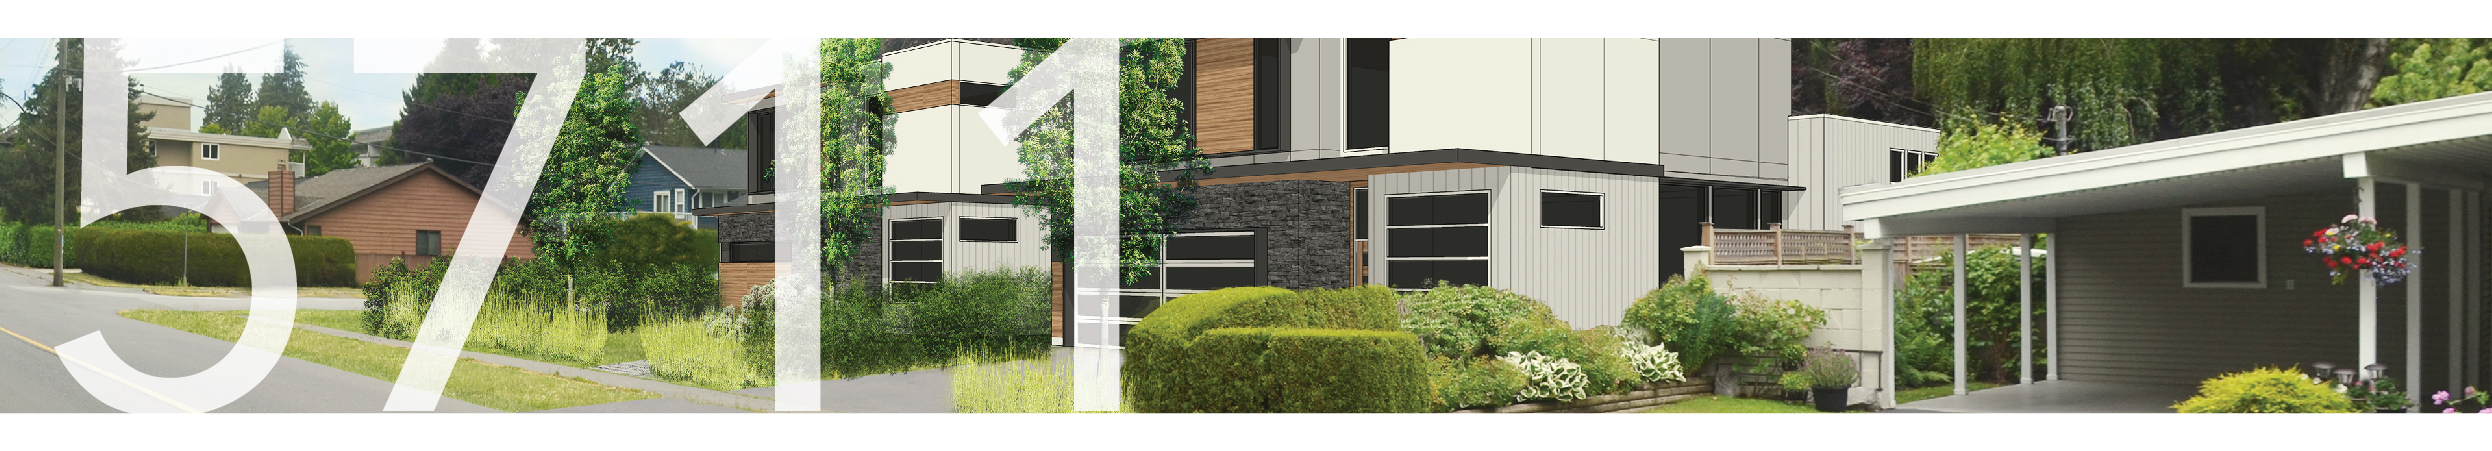 Project Tiles-16.jpg